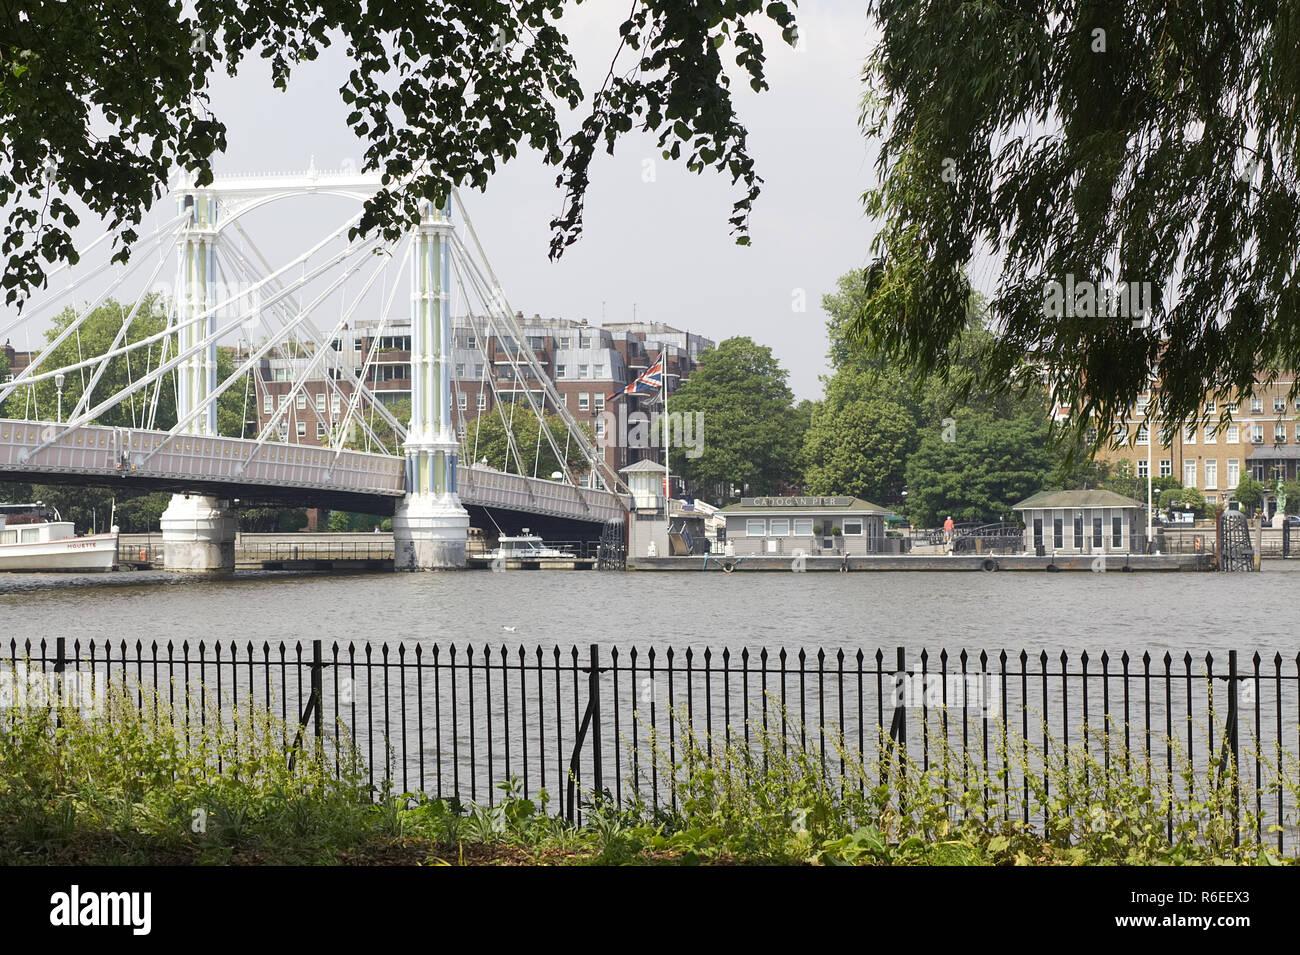 Albert Bridge from the Chelsea bank - Stock Image